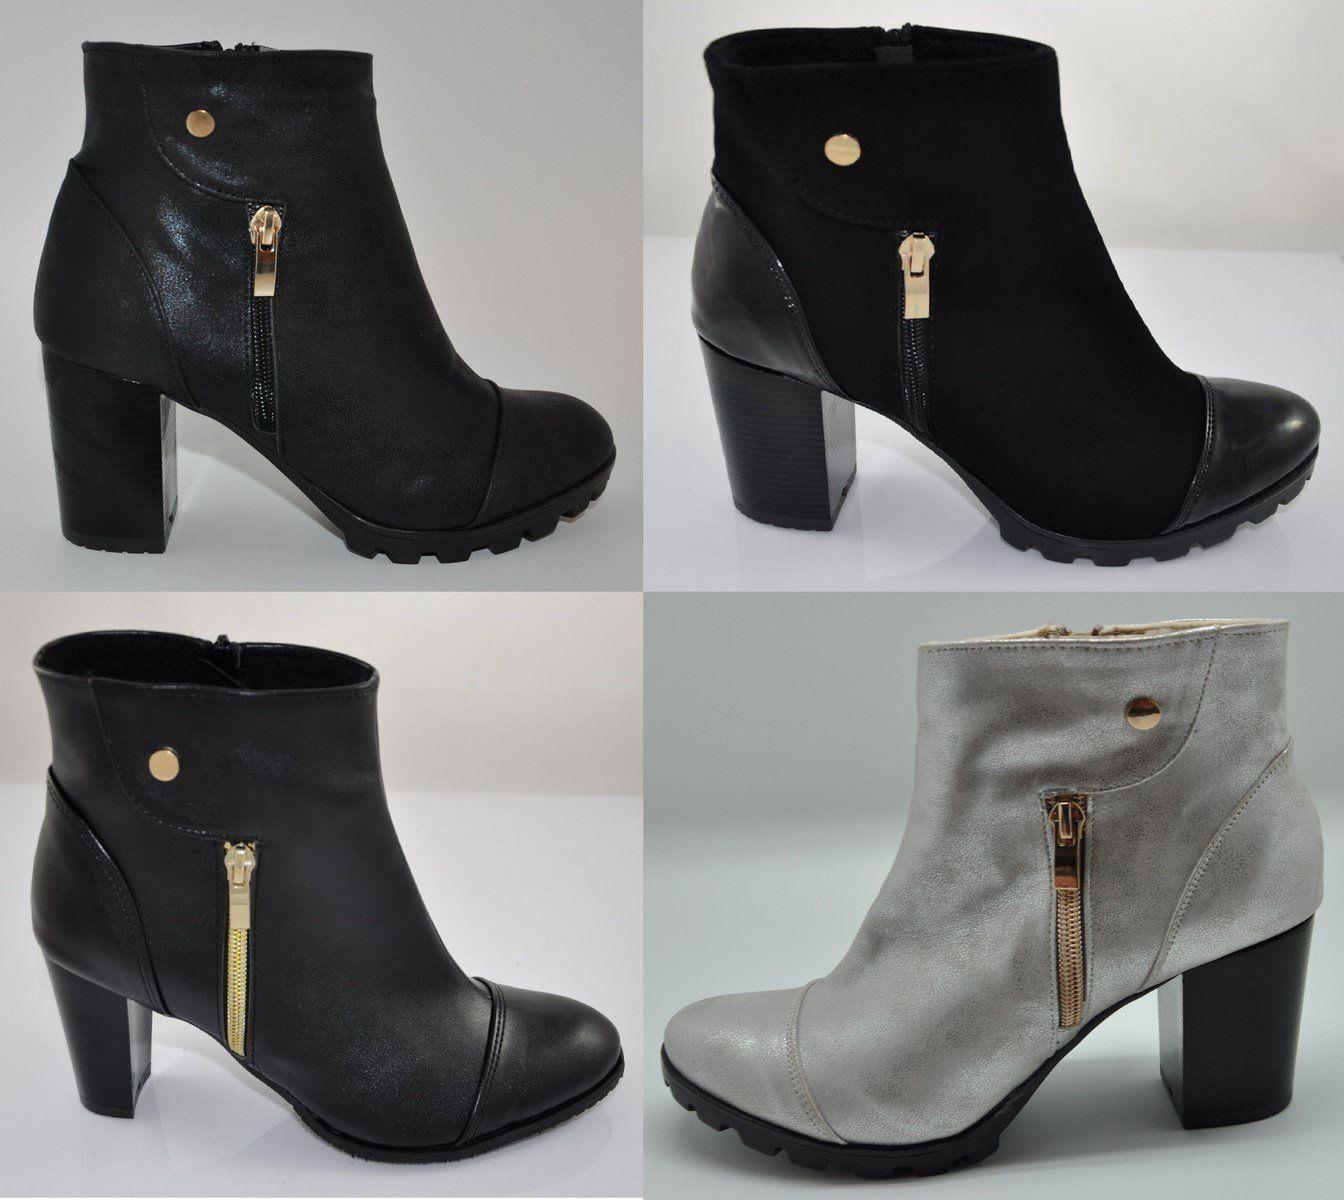 Polskie Botki Obcas Slupek 8 Cm 4 Kolory R 35 41 6558774832 Oficjalne Archiwum Allegro Boots Ankle Boot Shoes